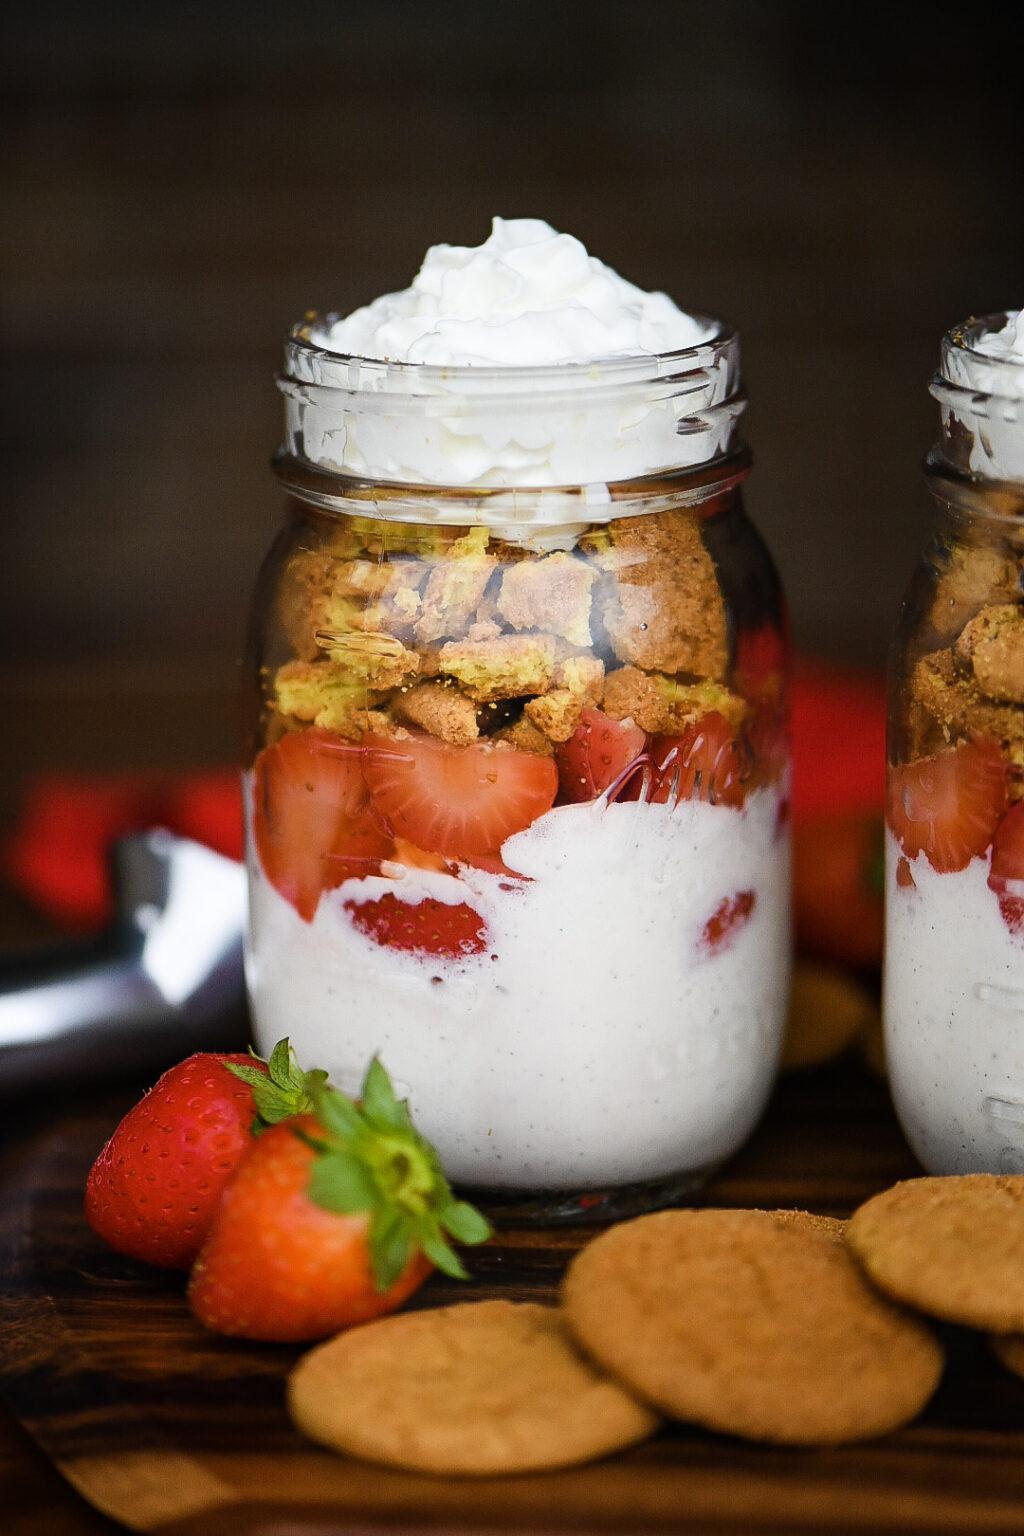 Strawberry & Lemon Cookie Ice Cream Trifle